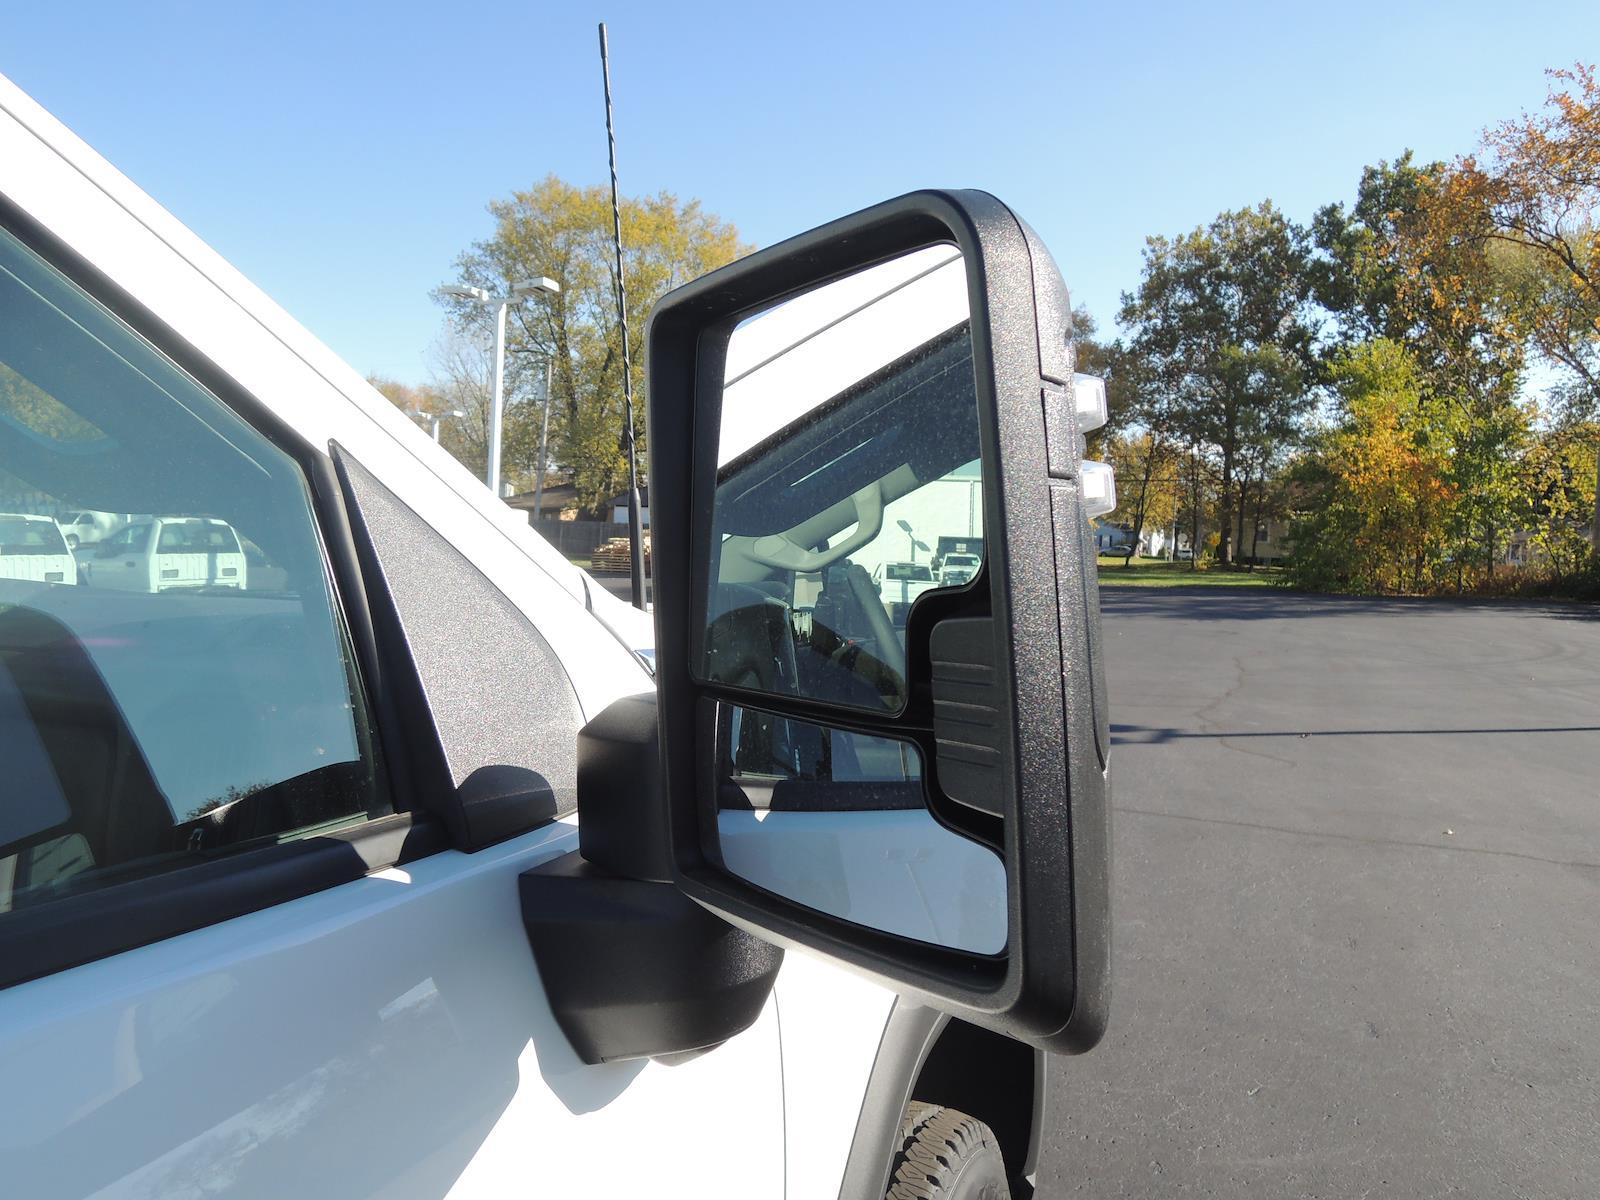 2020 GMC Sierra 2500 Regular Cab 4x2, Monroe MSS II Service Body #LT852 - photo 10